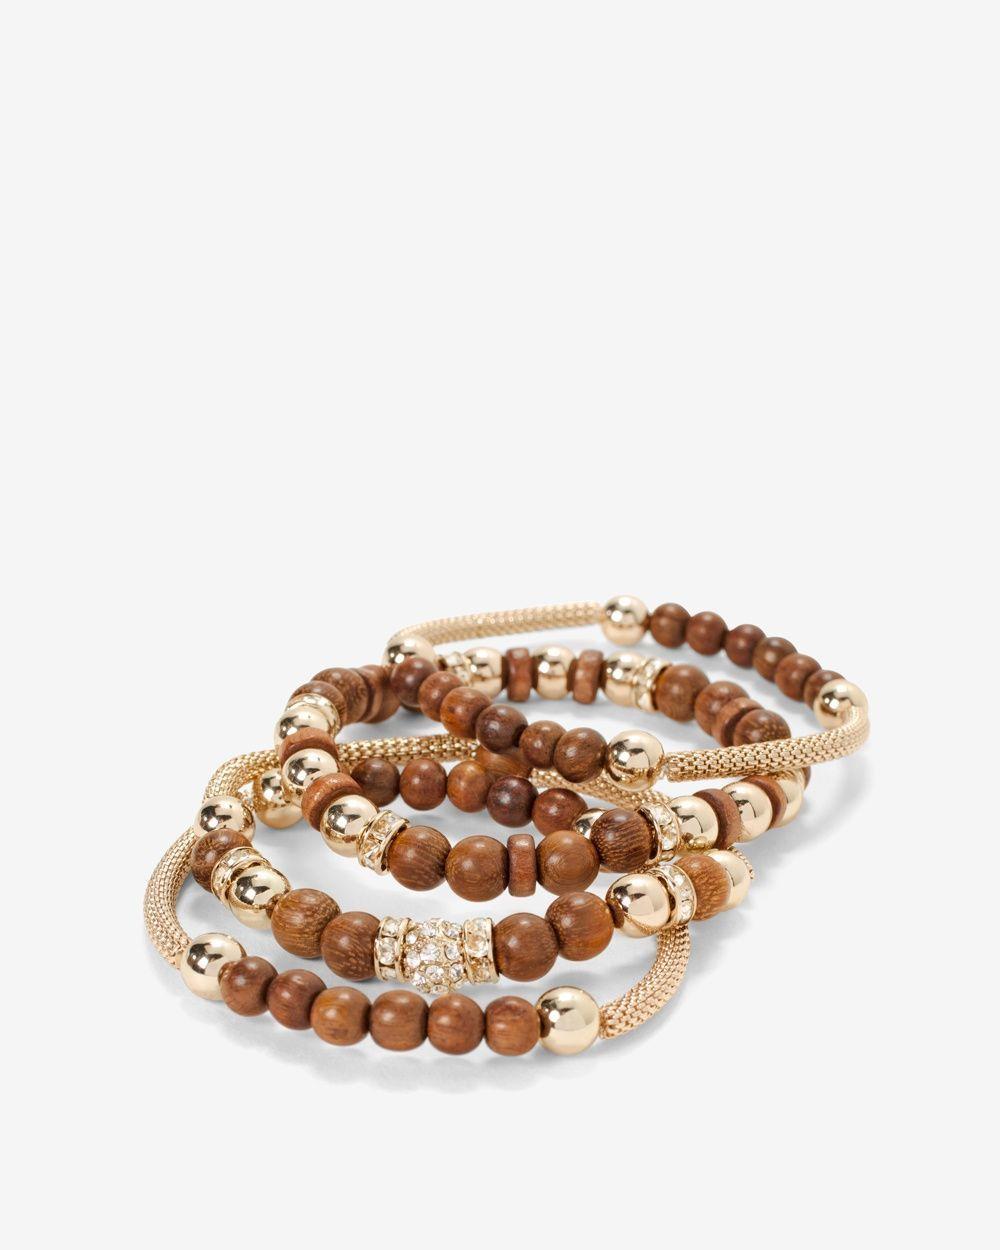 Wooden Mesh Stretch Bracelet Set